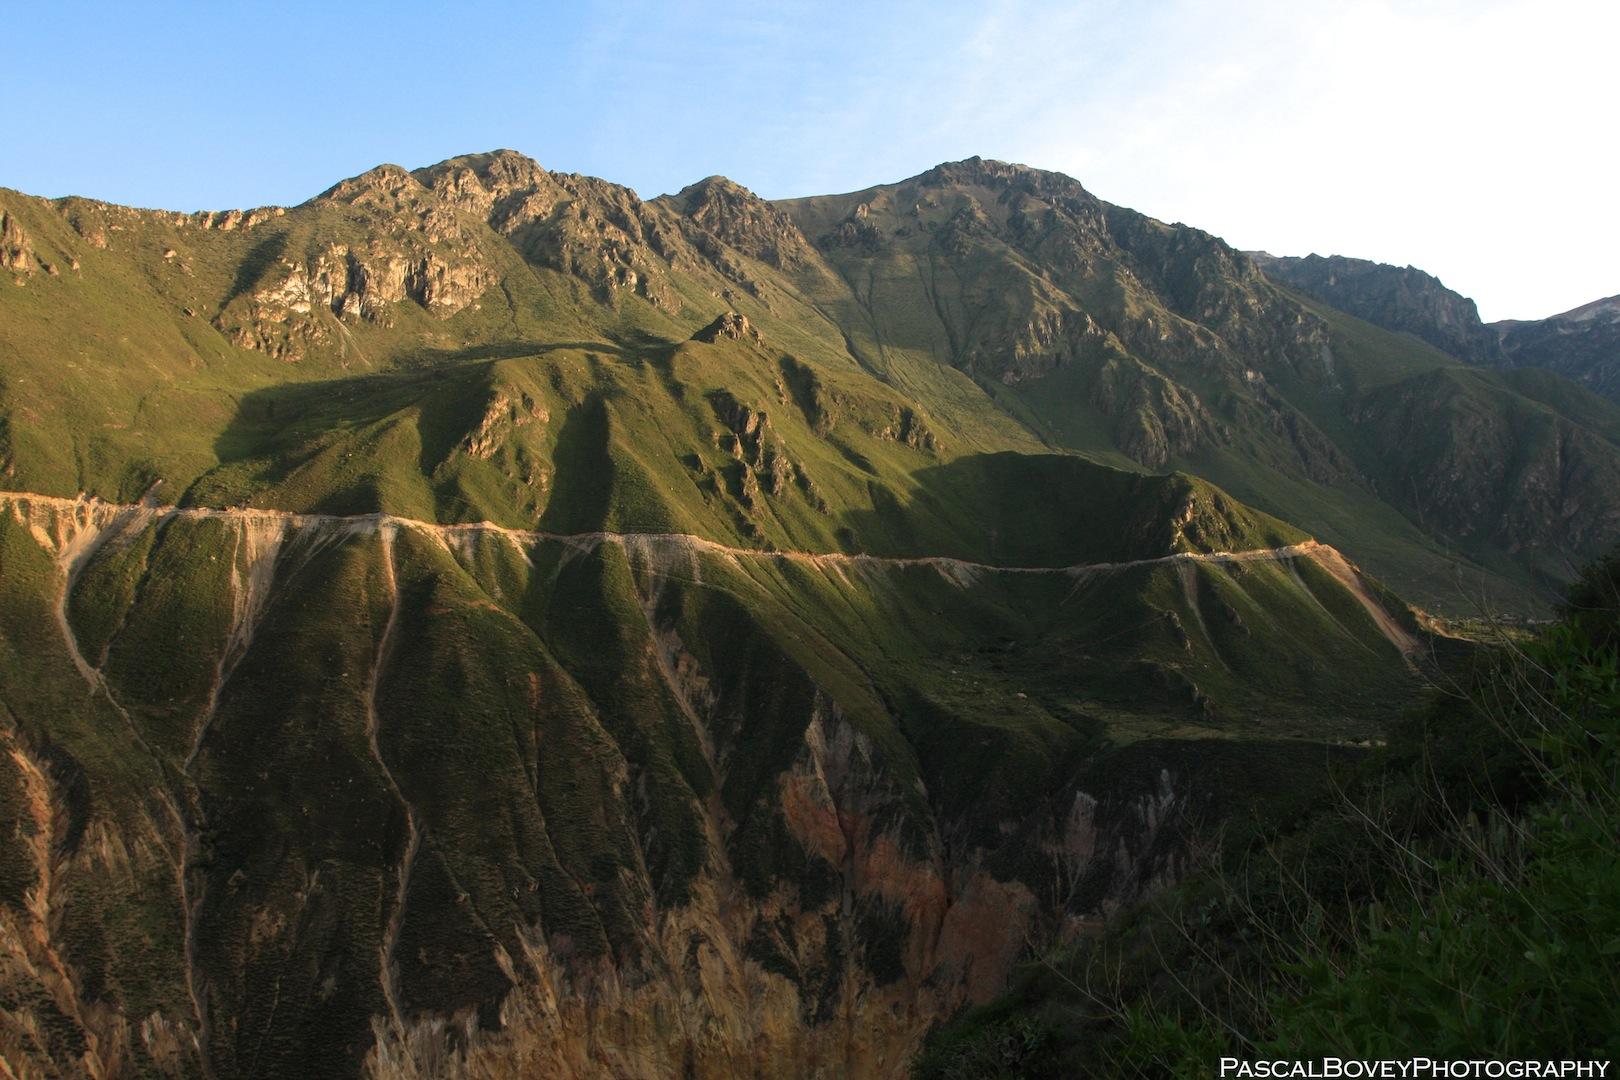 Sunrise in Colca Canyon